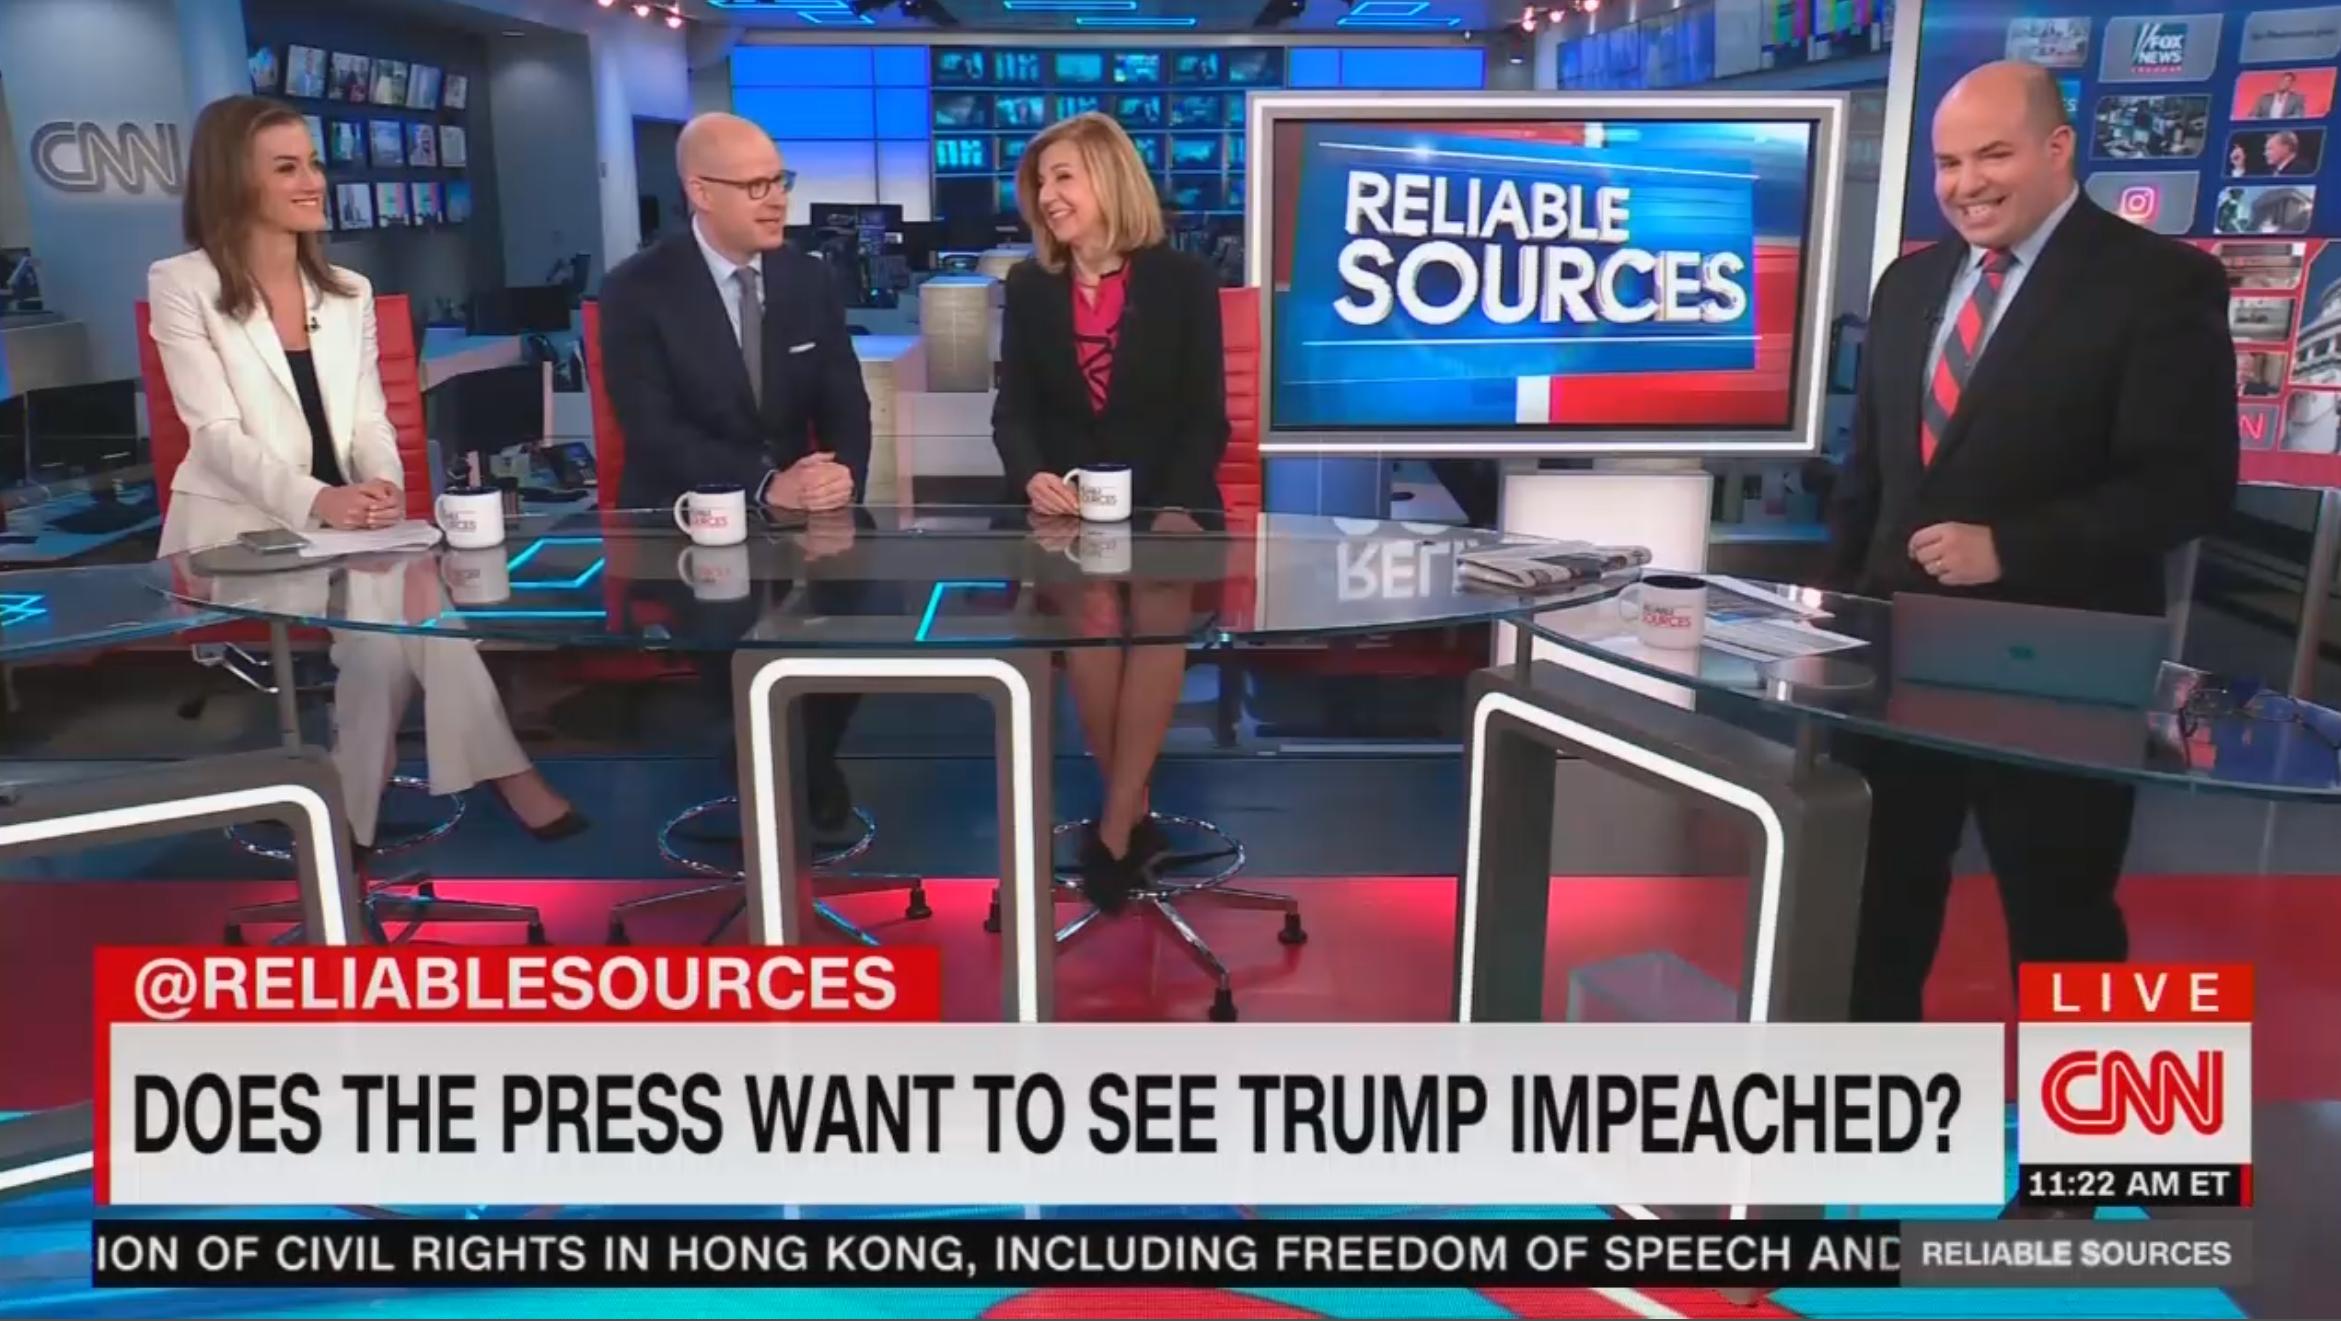 Margaret Sullivan: Media Not Pushing Impeachment, 'Anathema' to the